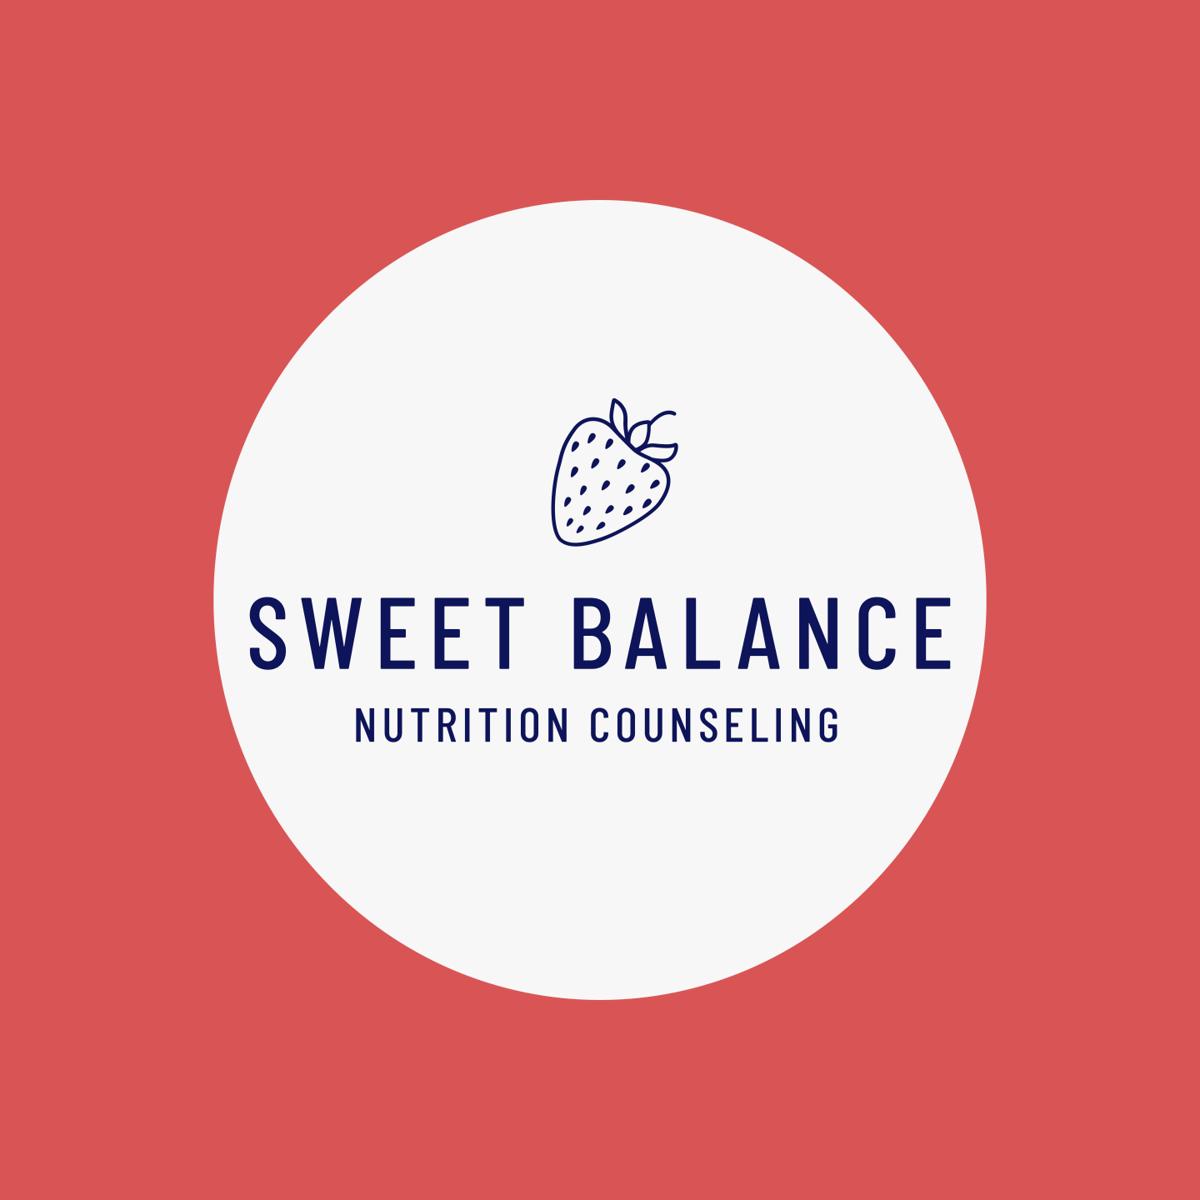 Sweet Balance